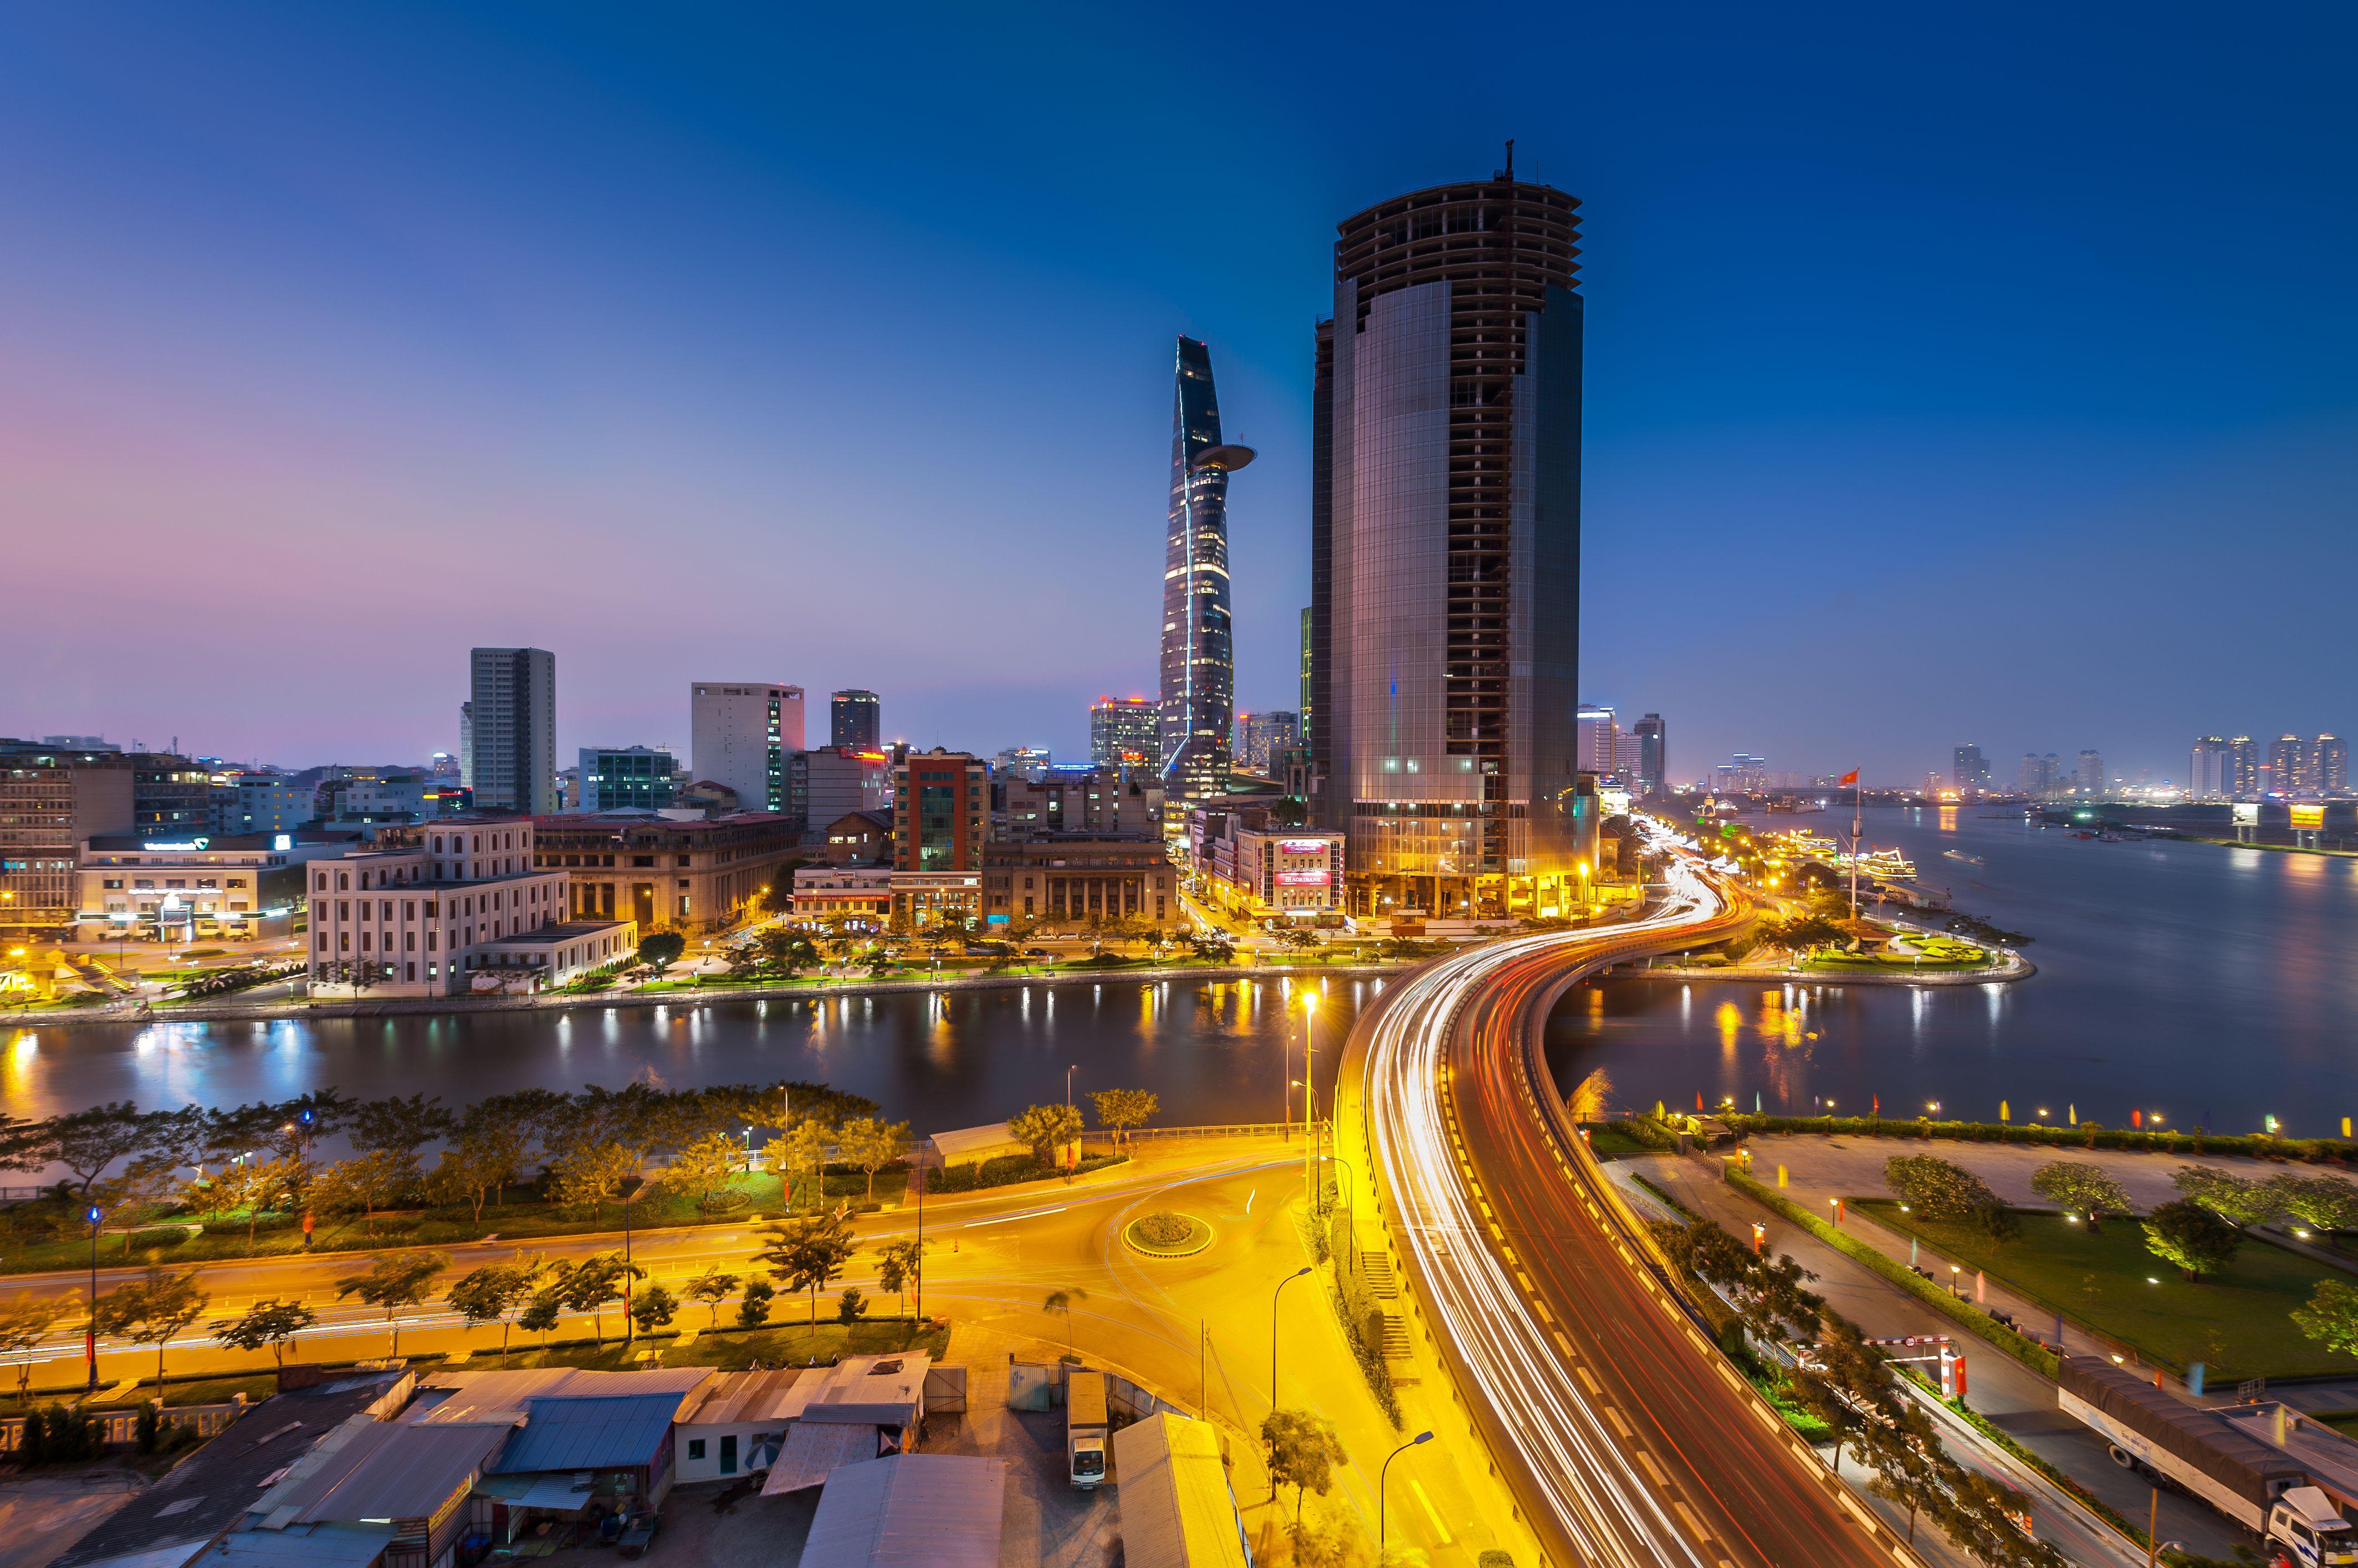 Why did Saigon change its name to Ho Chi Minh City? - Quora